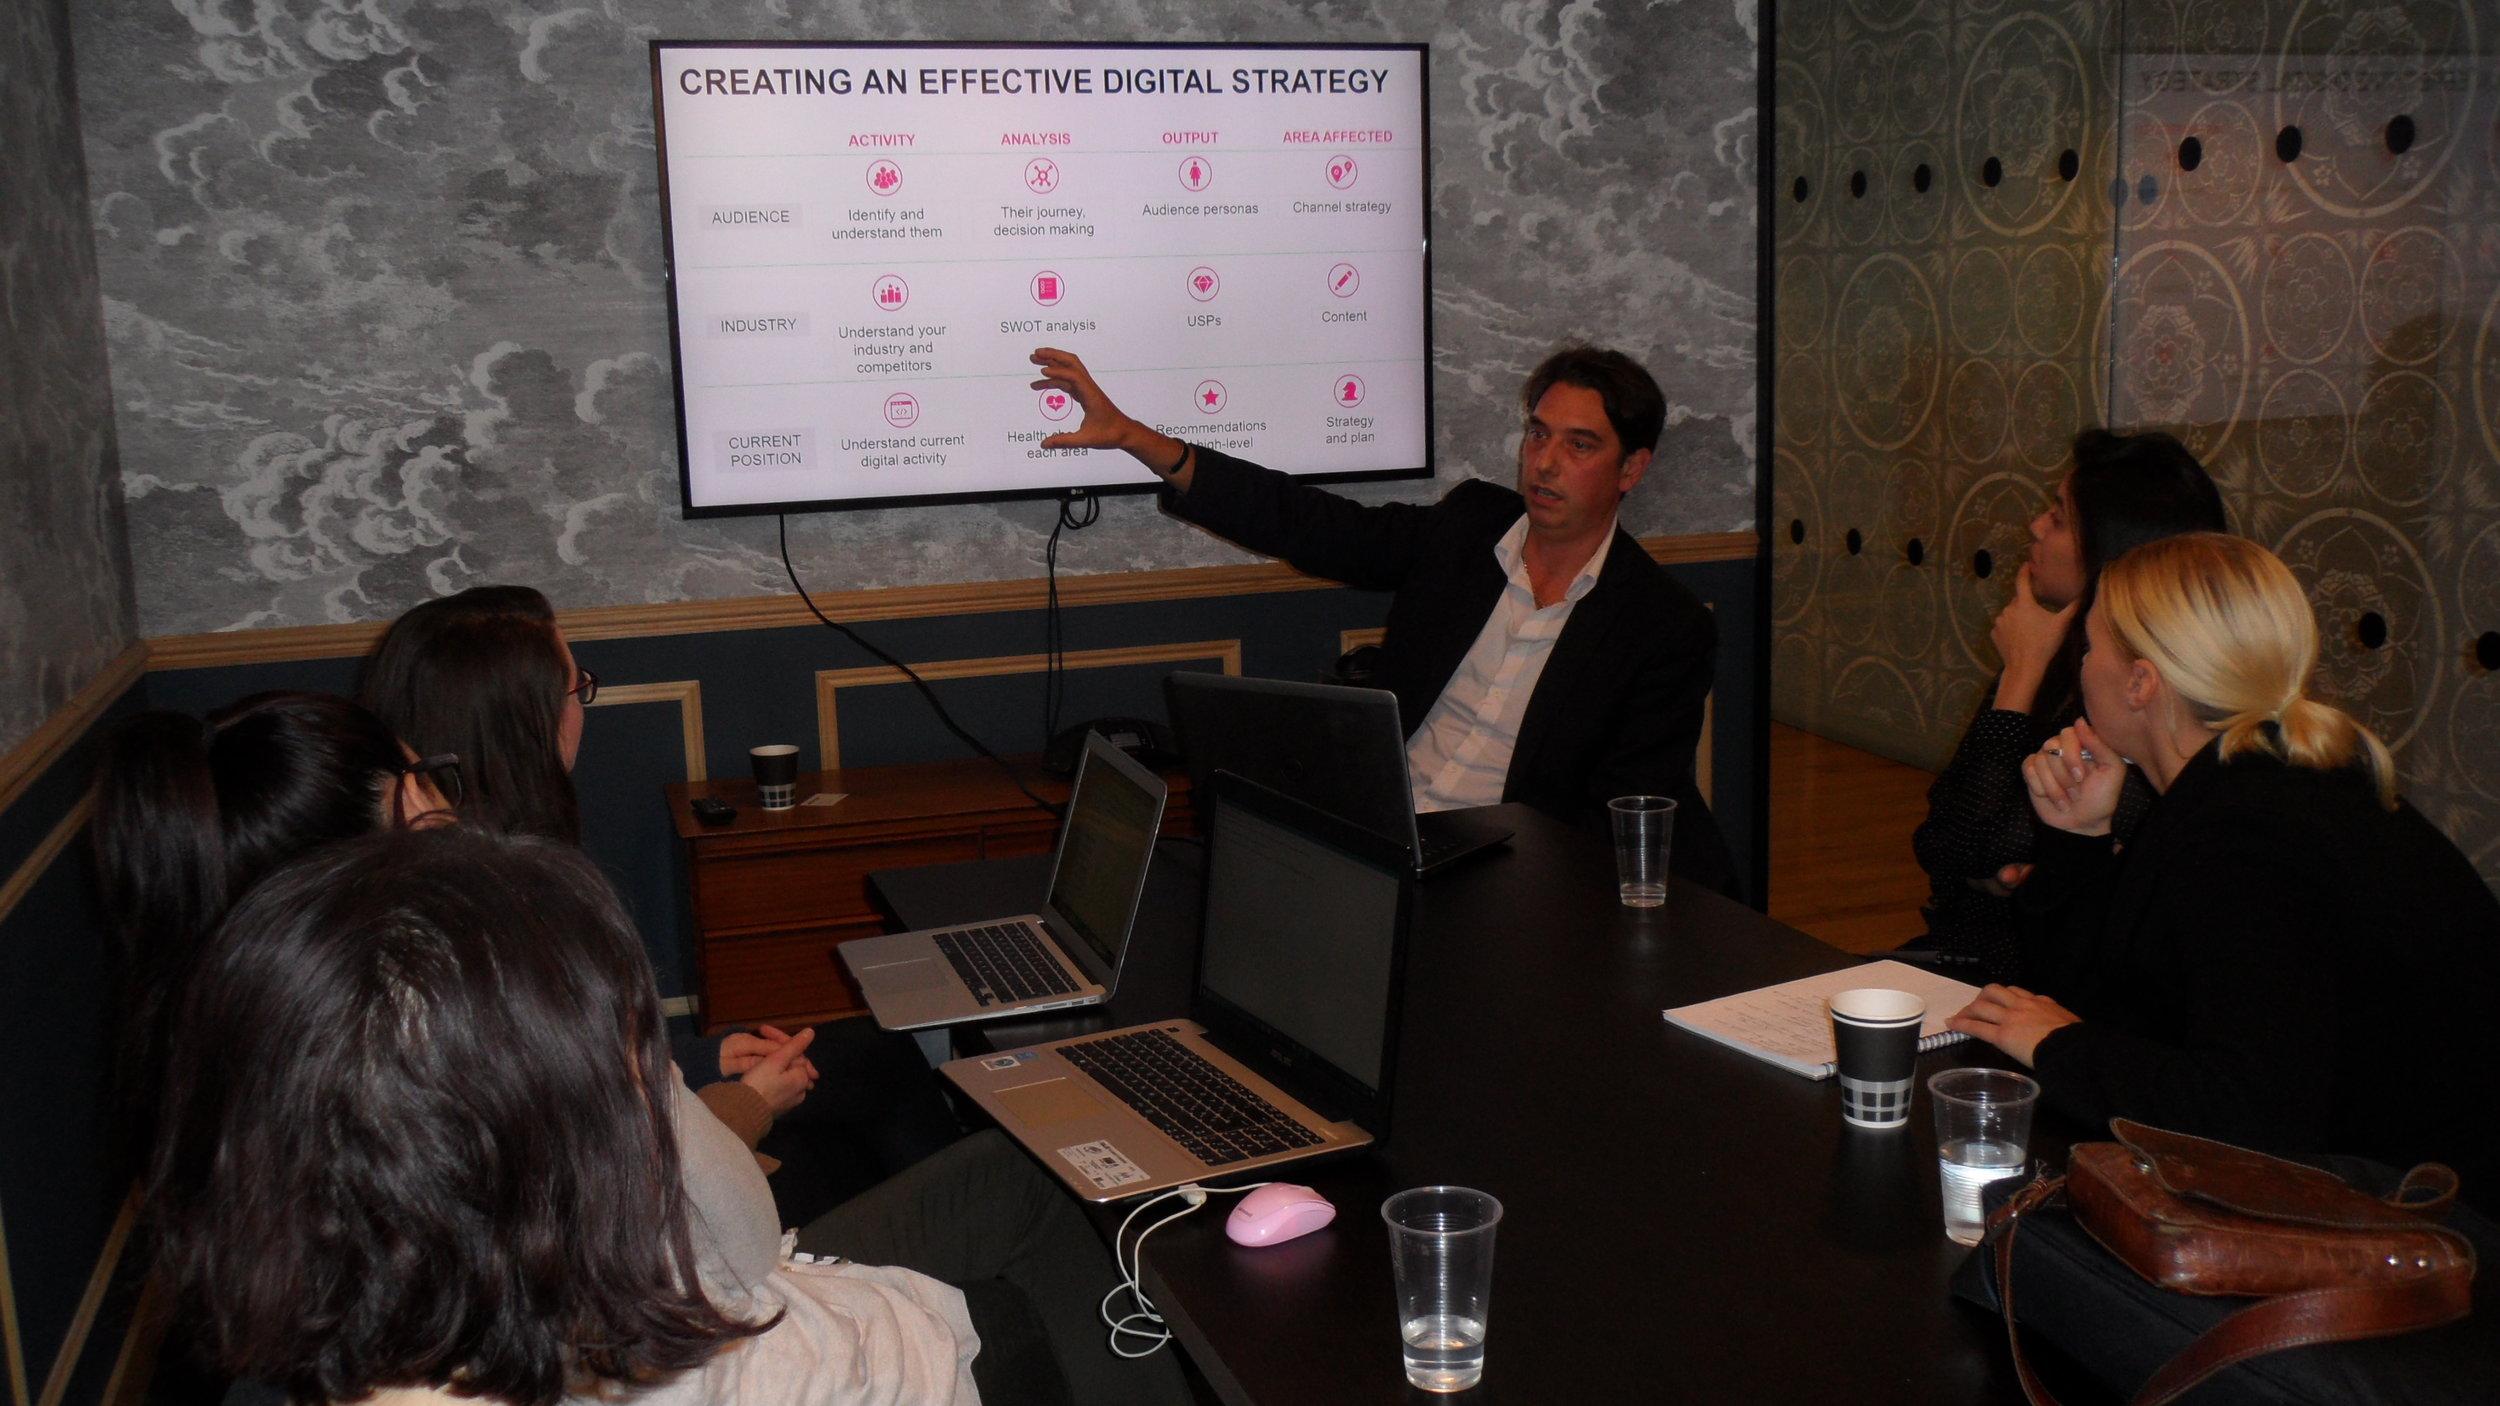 Elliott King presenting the Digital Marketing workshop